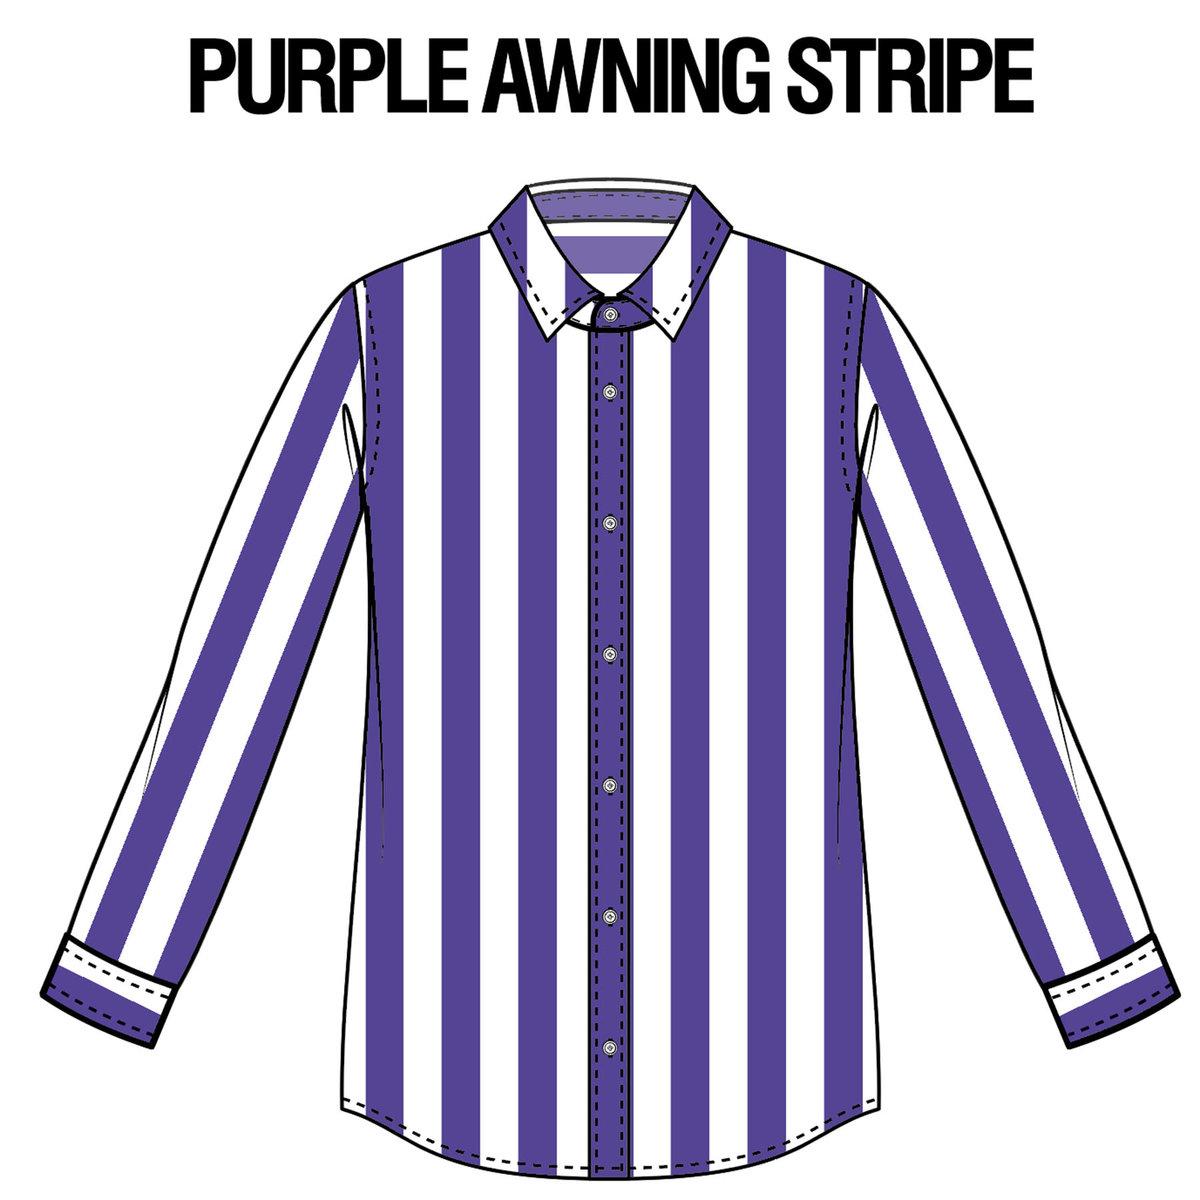 Purple Awning Stripe.jpg